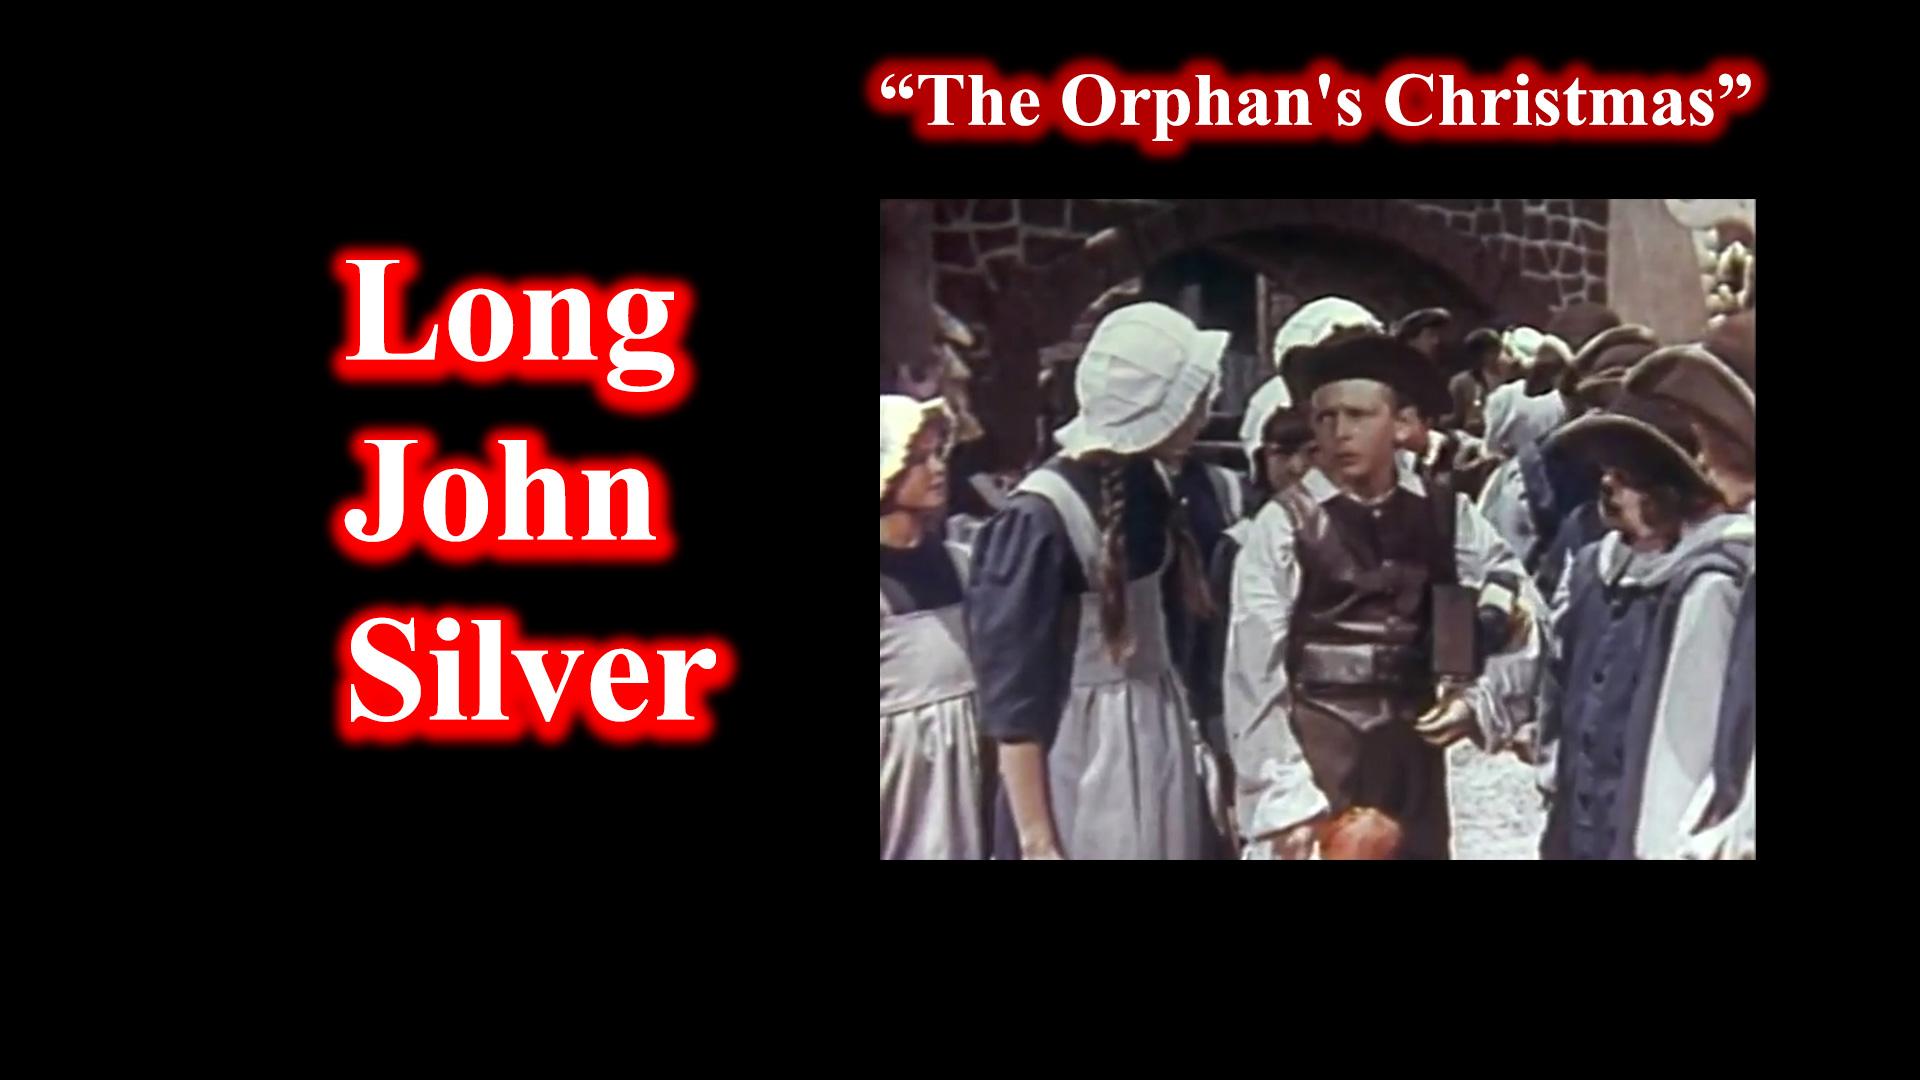 The Orphans Christmas